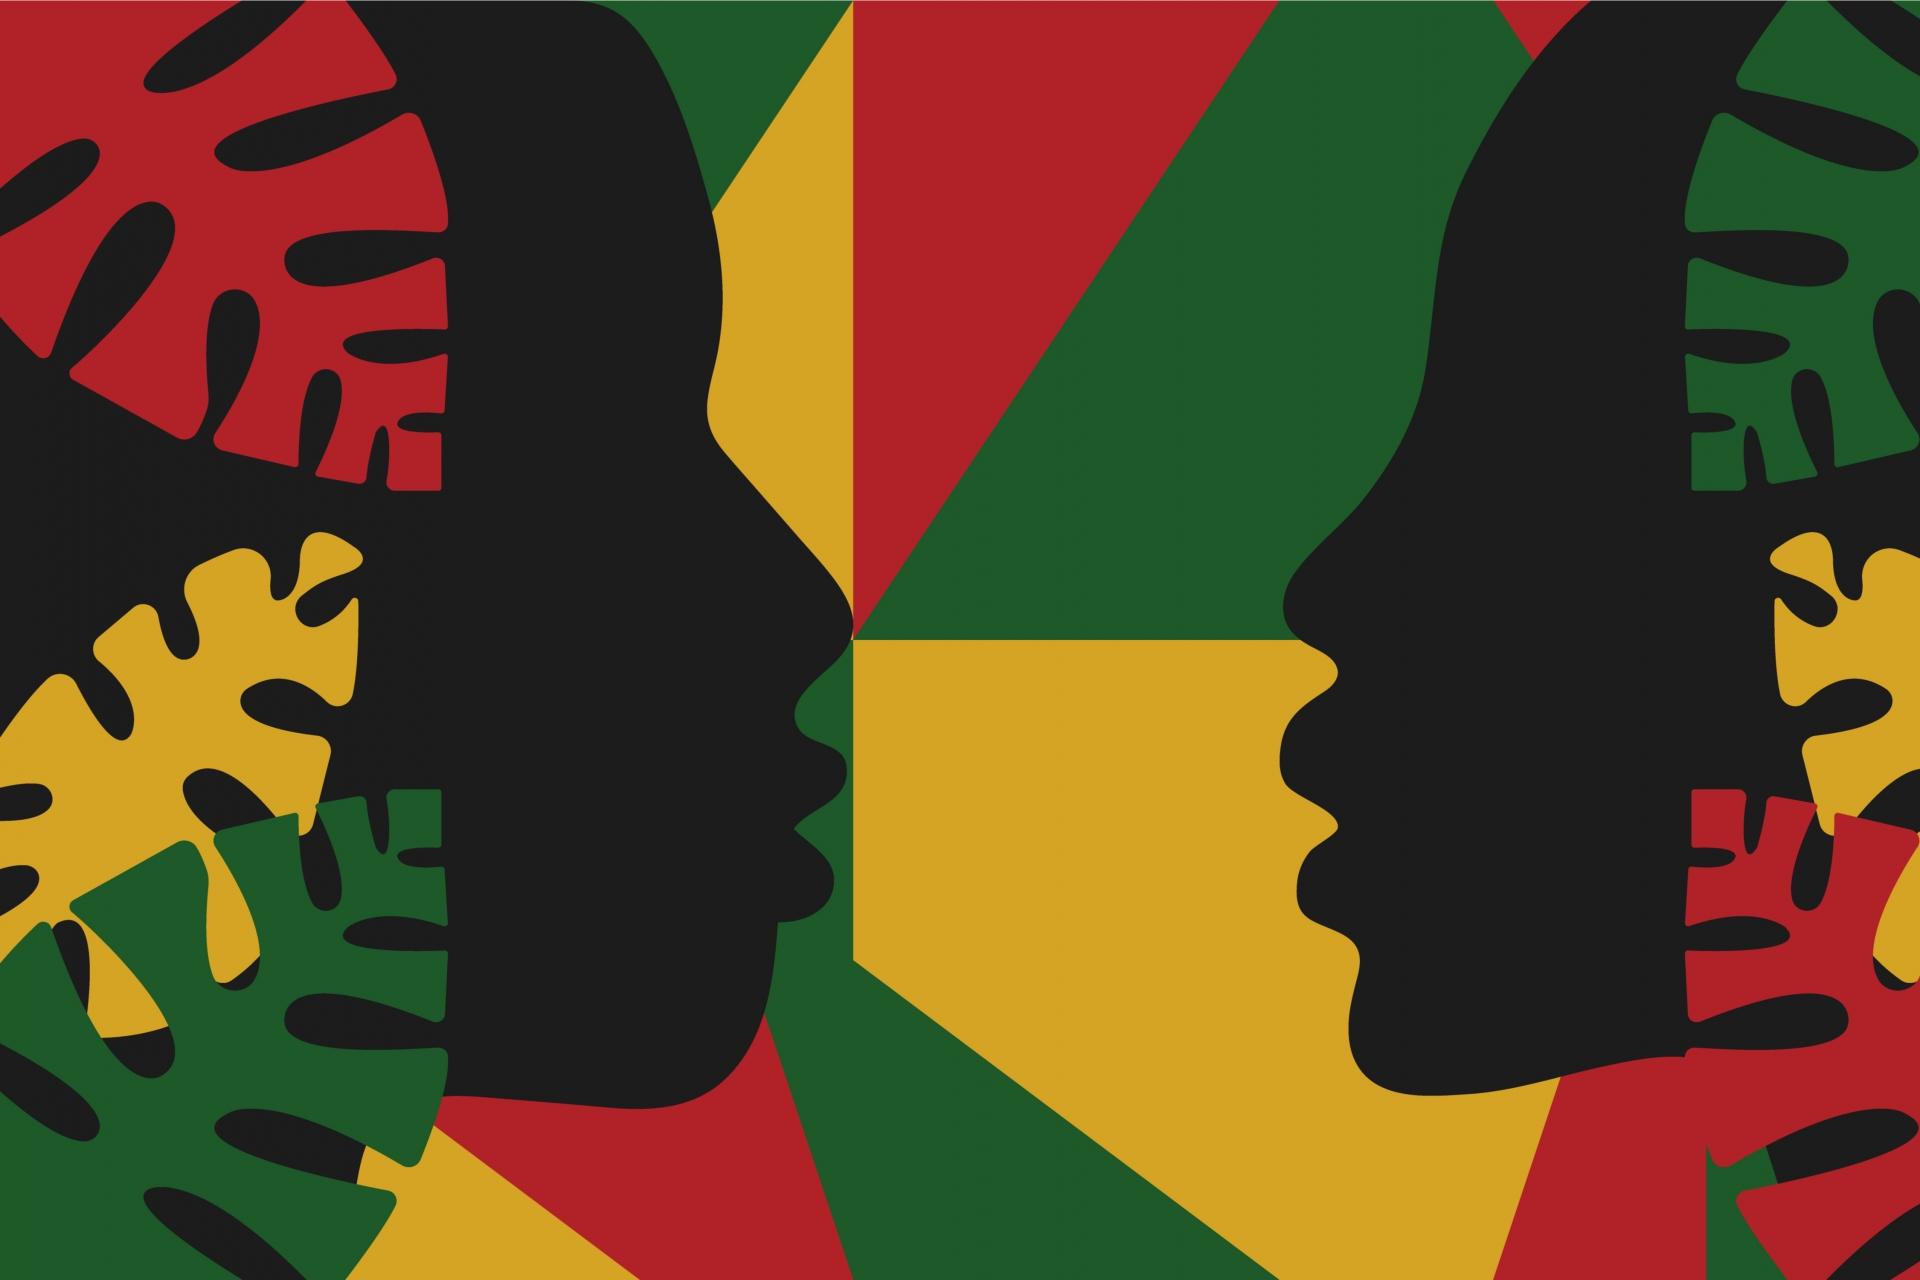 40 Children's Books Celebrating Black History & Culture